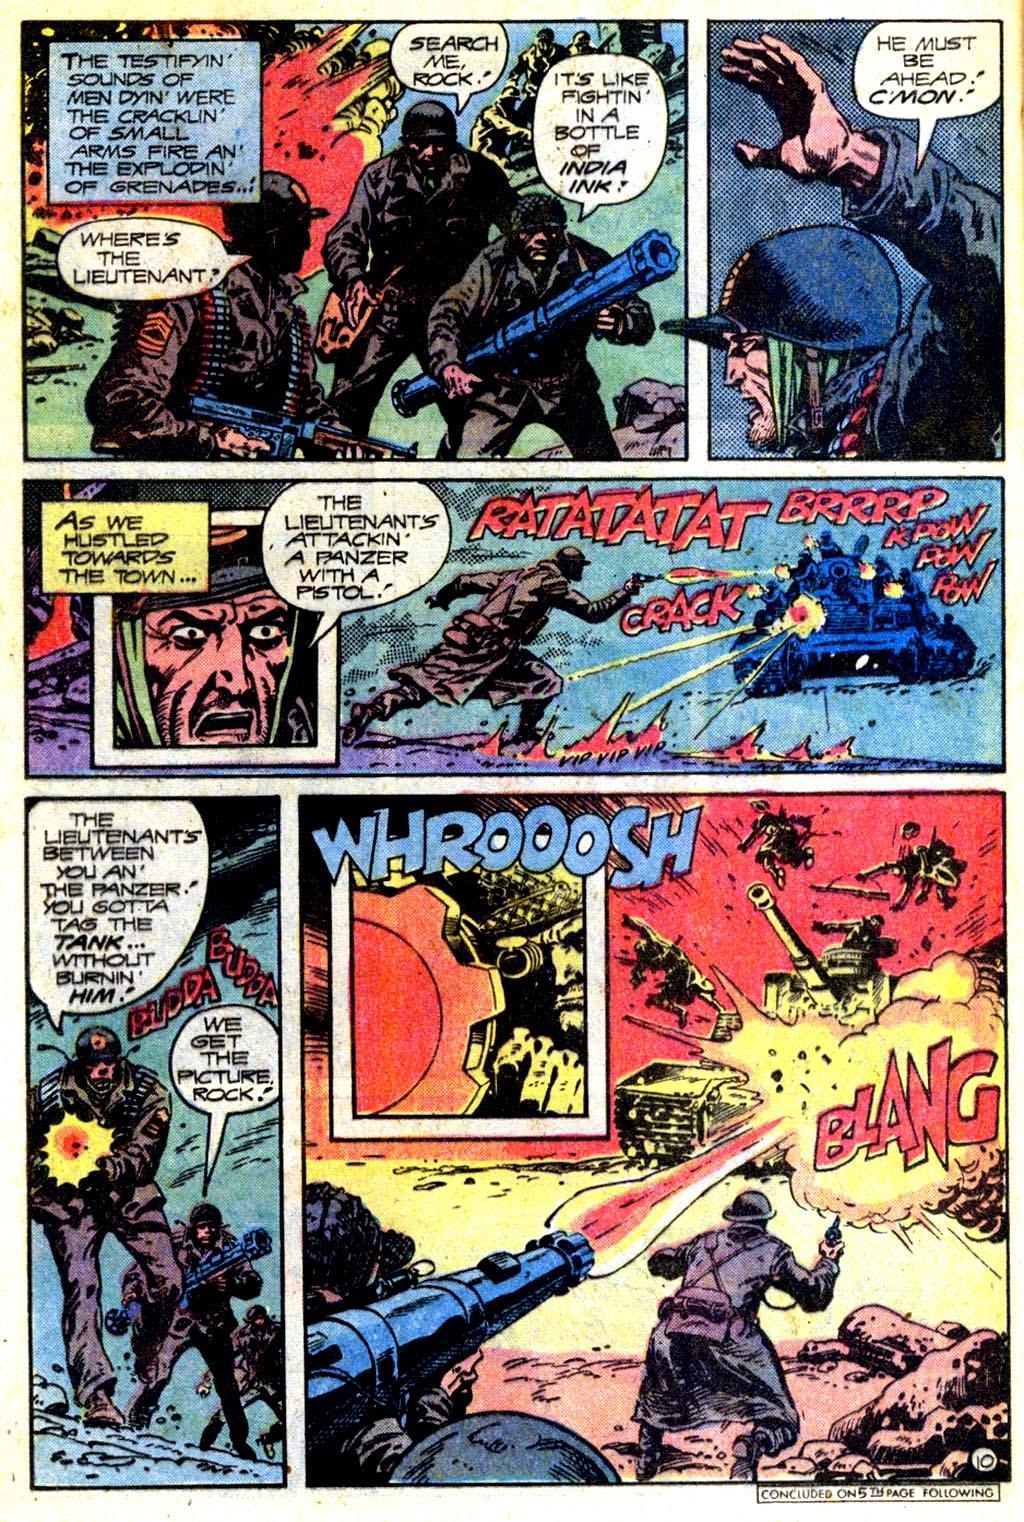 Read online Sgt. Rock comic -  Issue #336 - 11